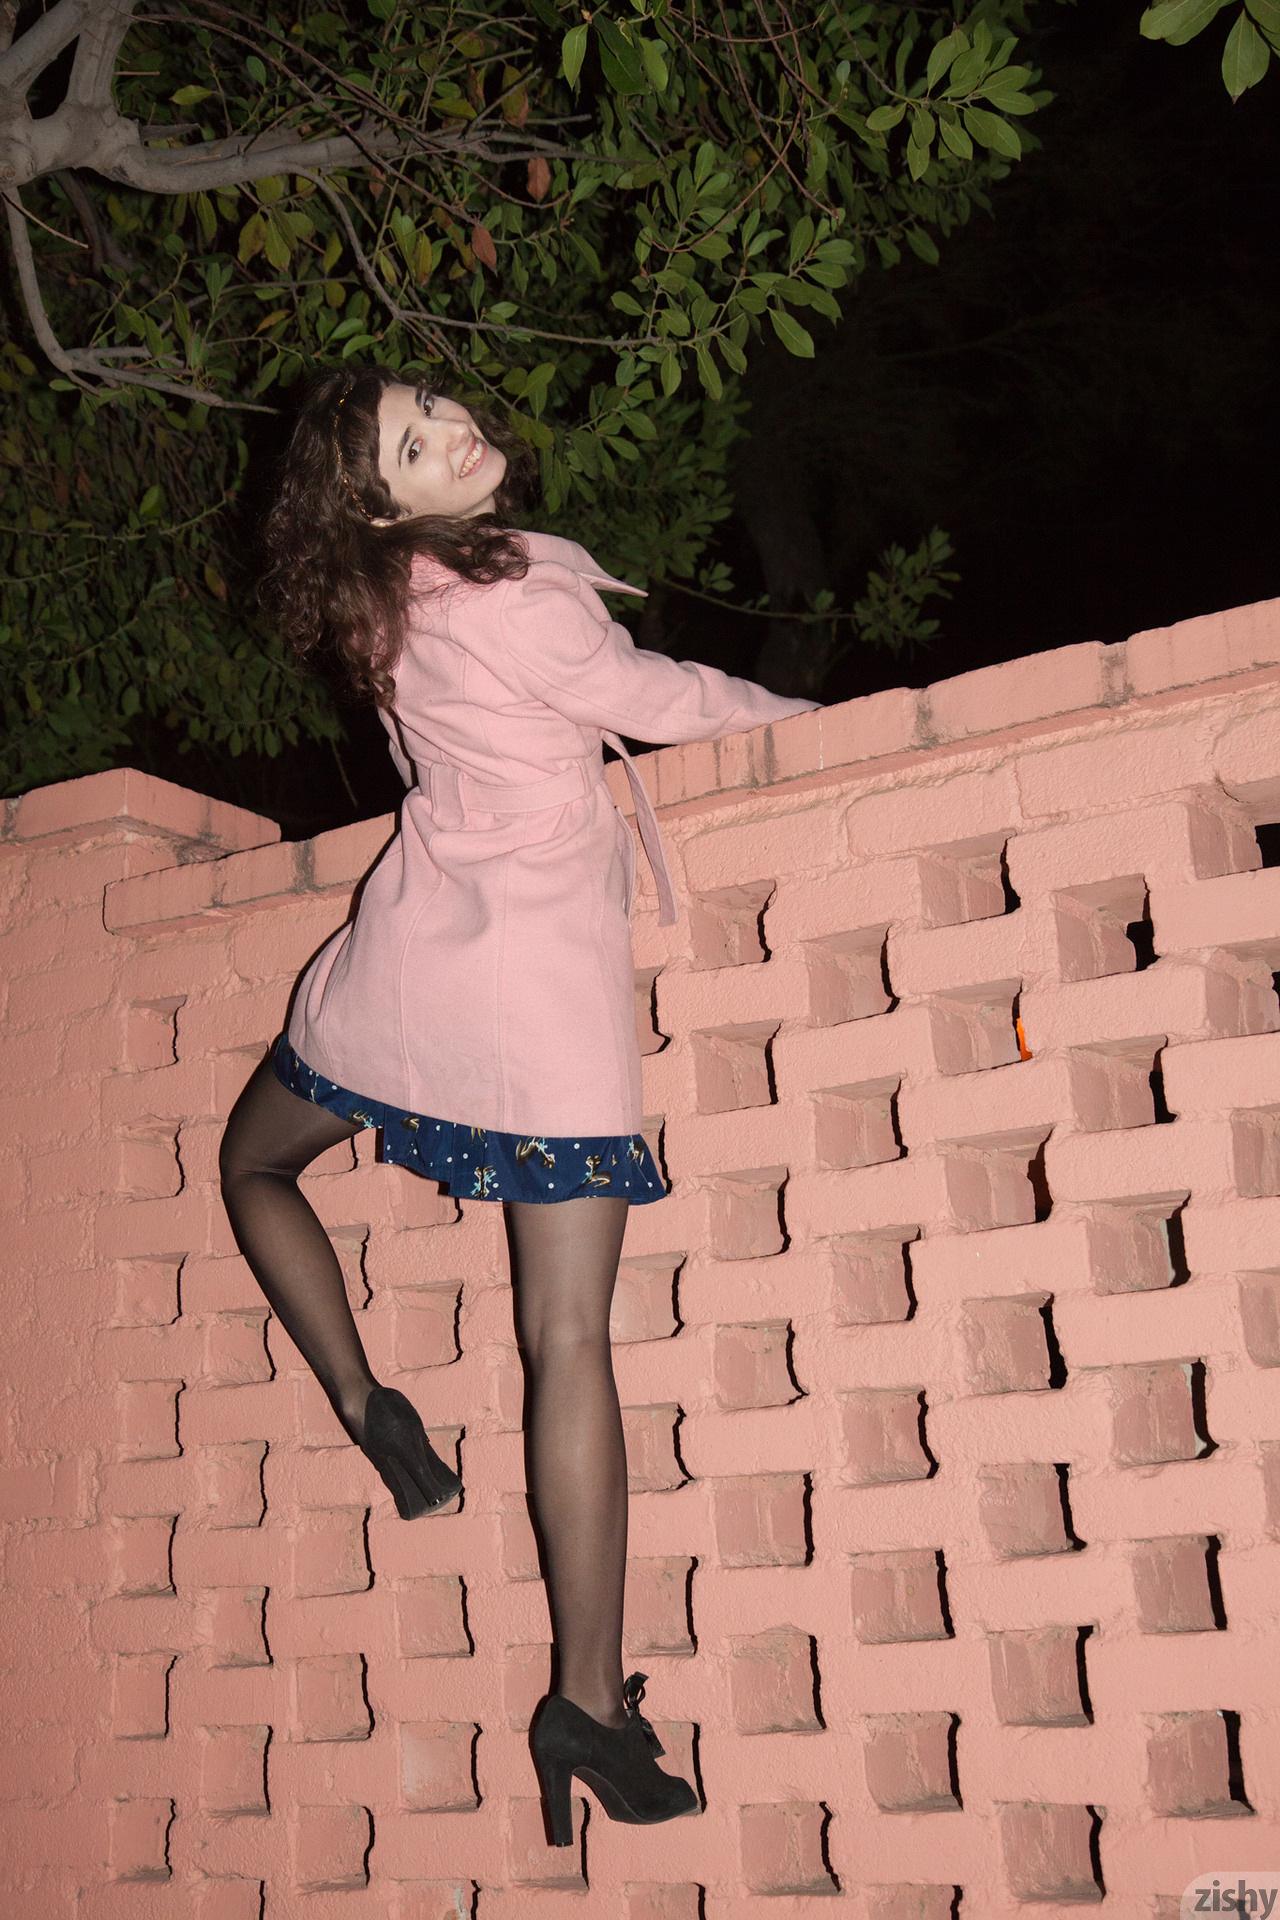 Yvette Nolot At Arizona Inn Zishy (47)